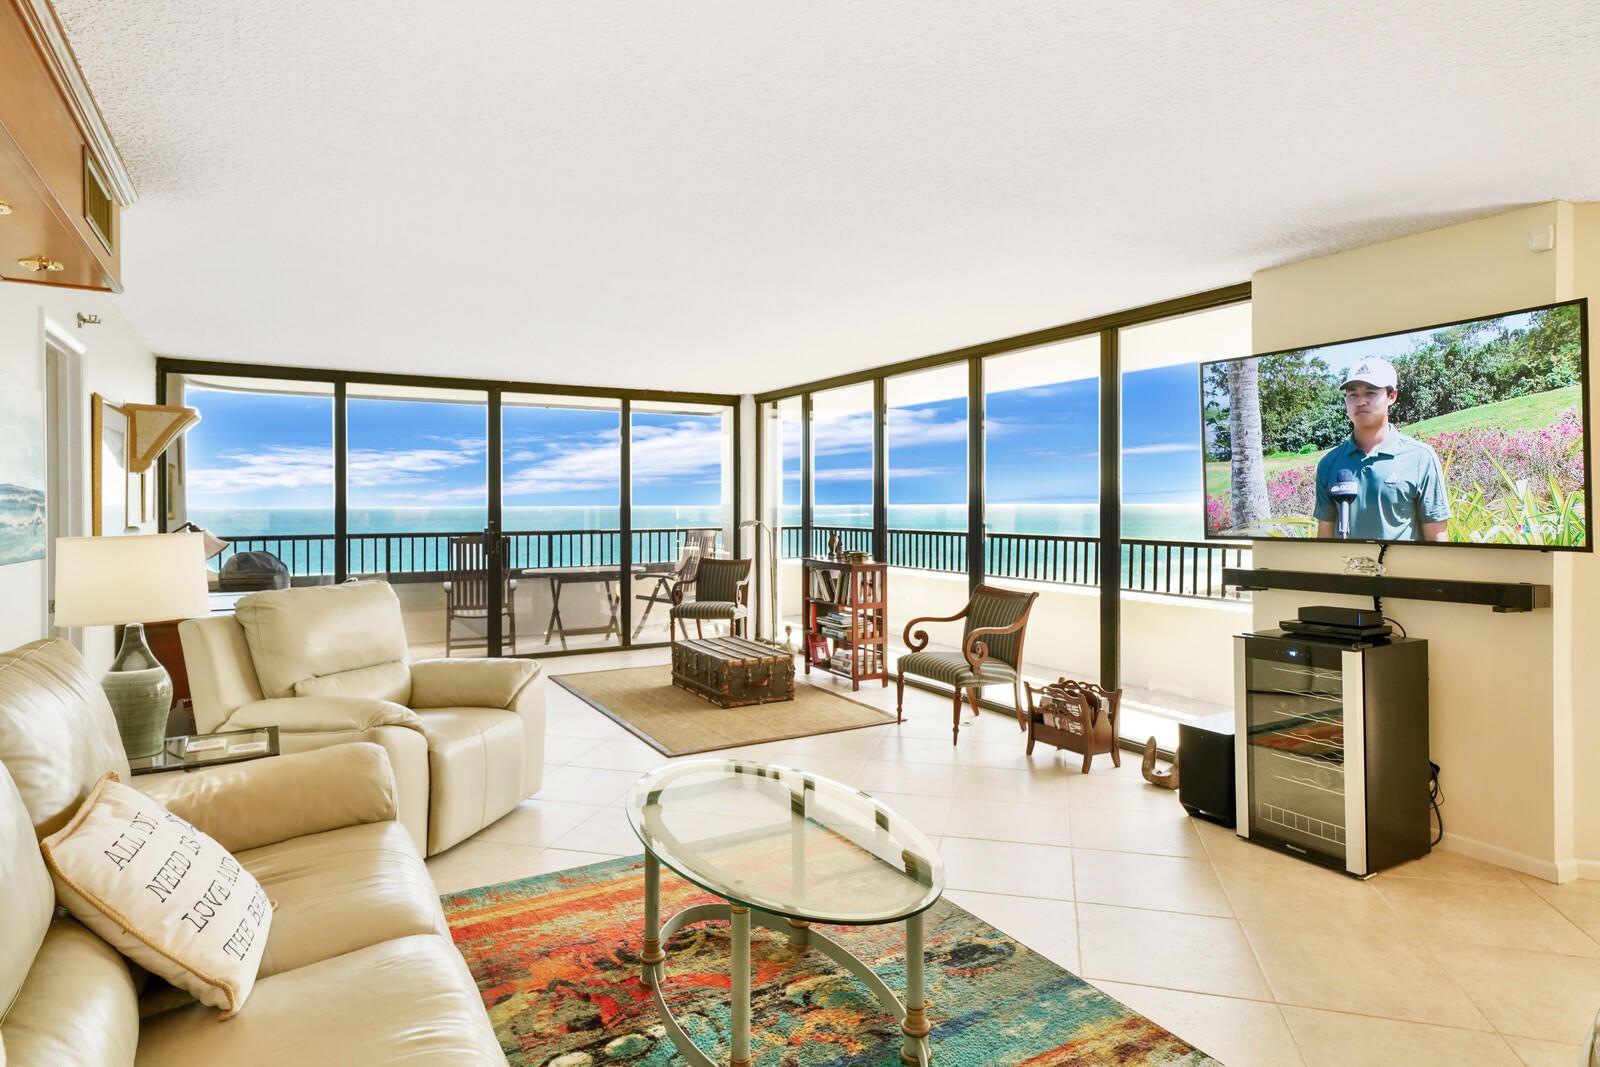 Photo of 600 Ocean Drive #11b, Juno Beach, FL 33408 (MLS # RX-10697004)